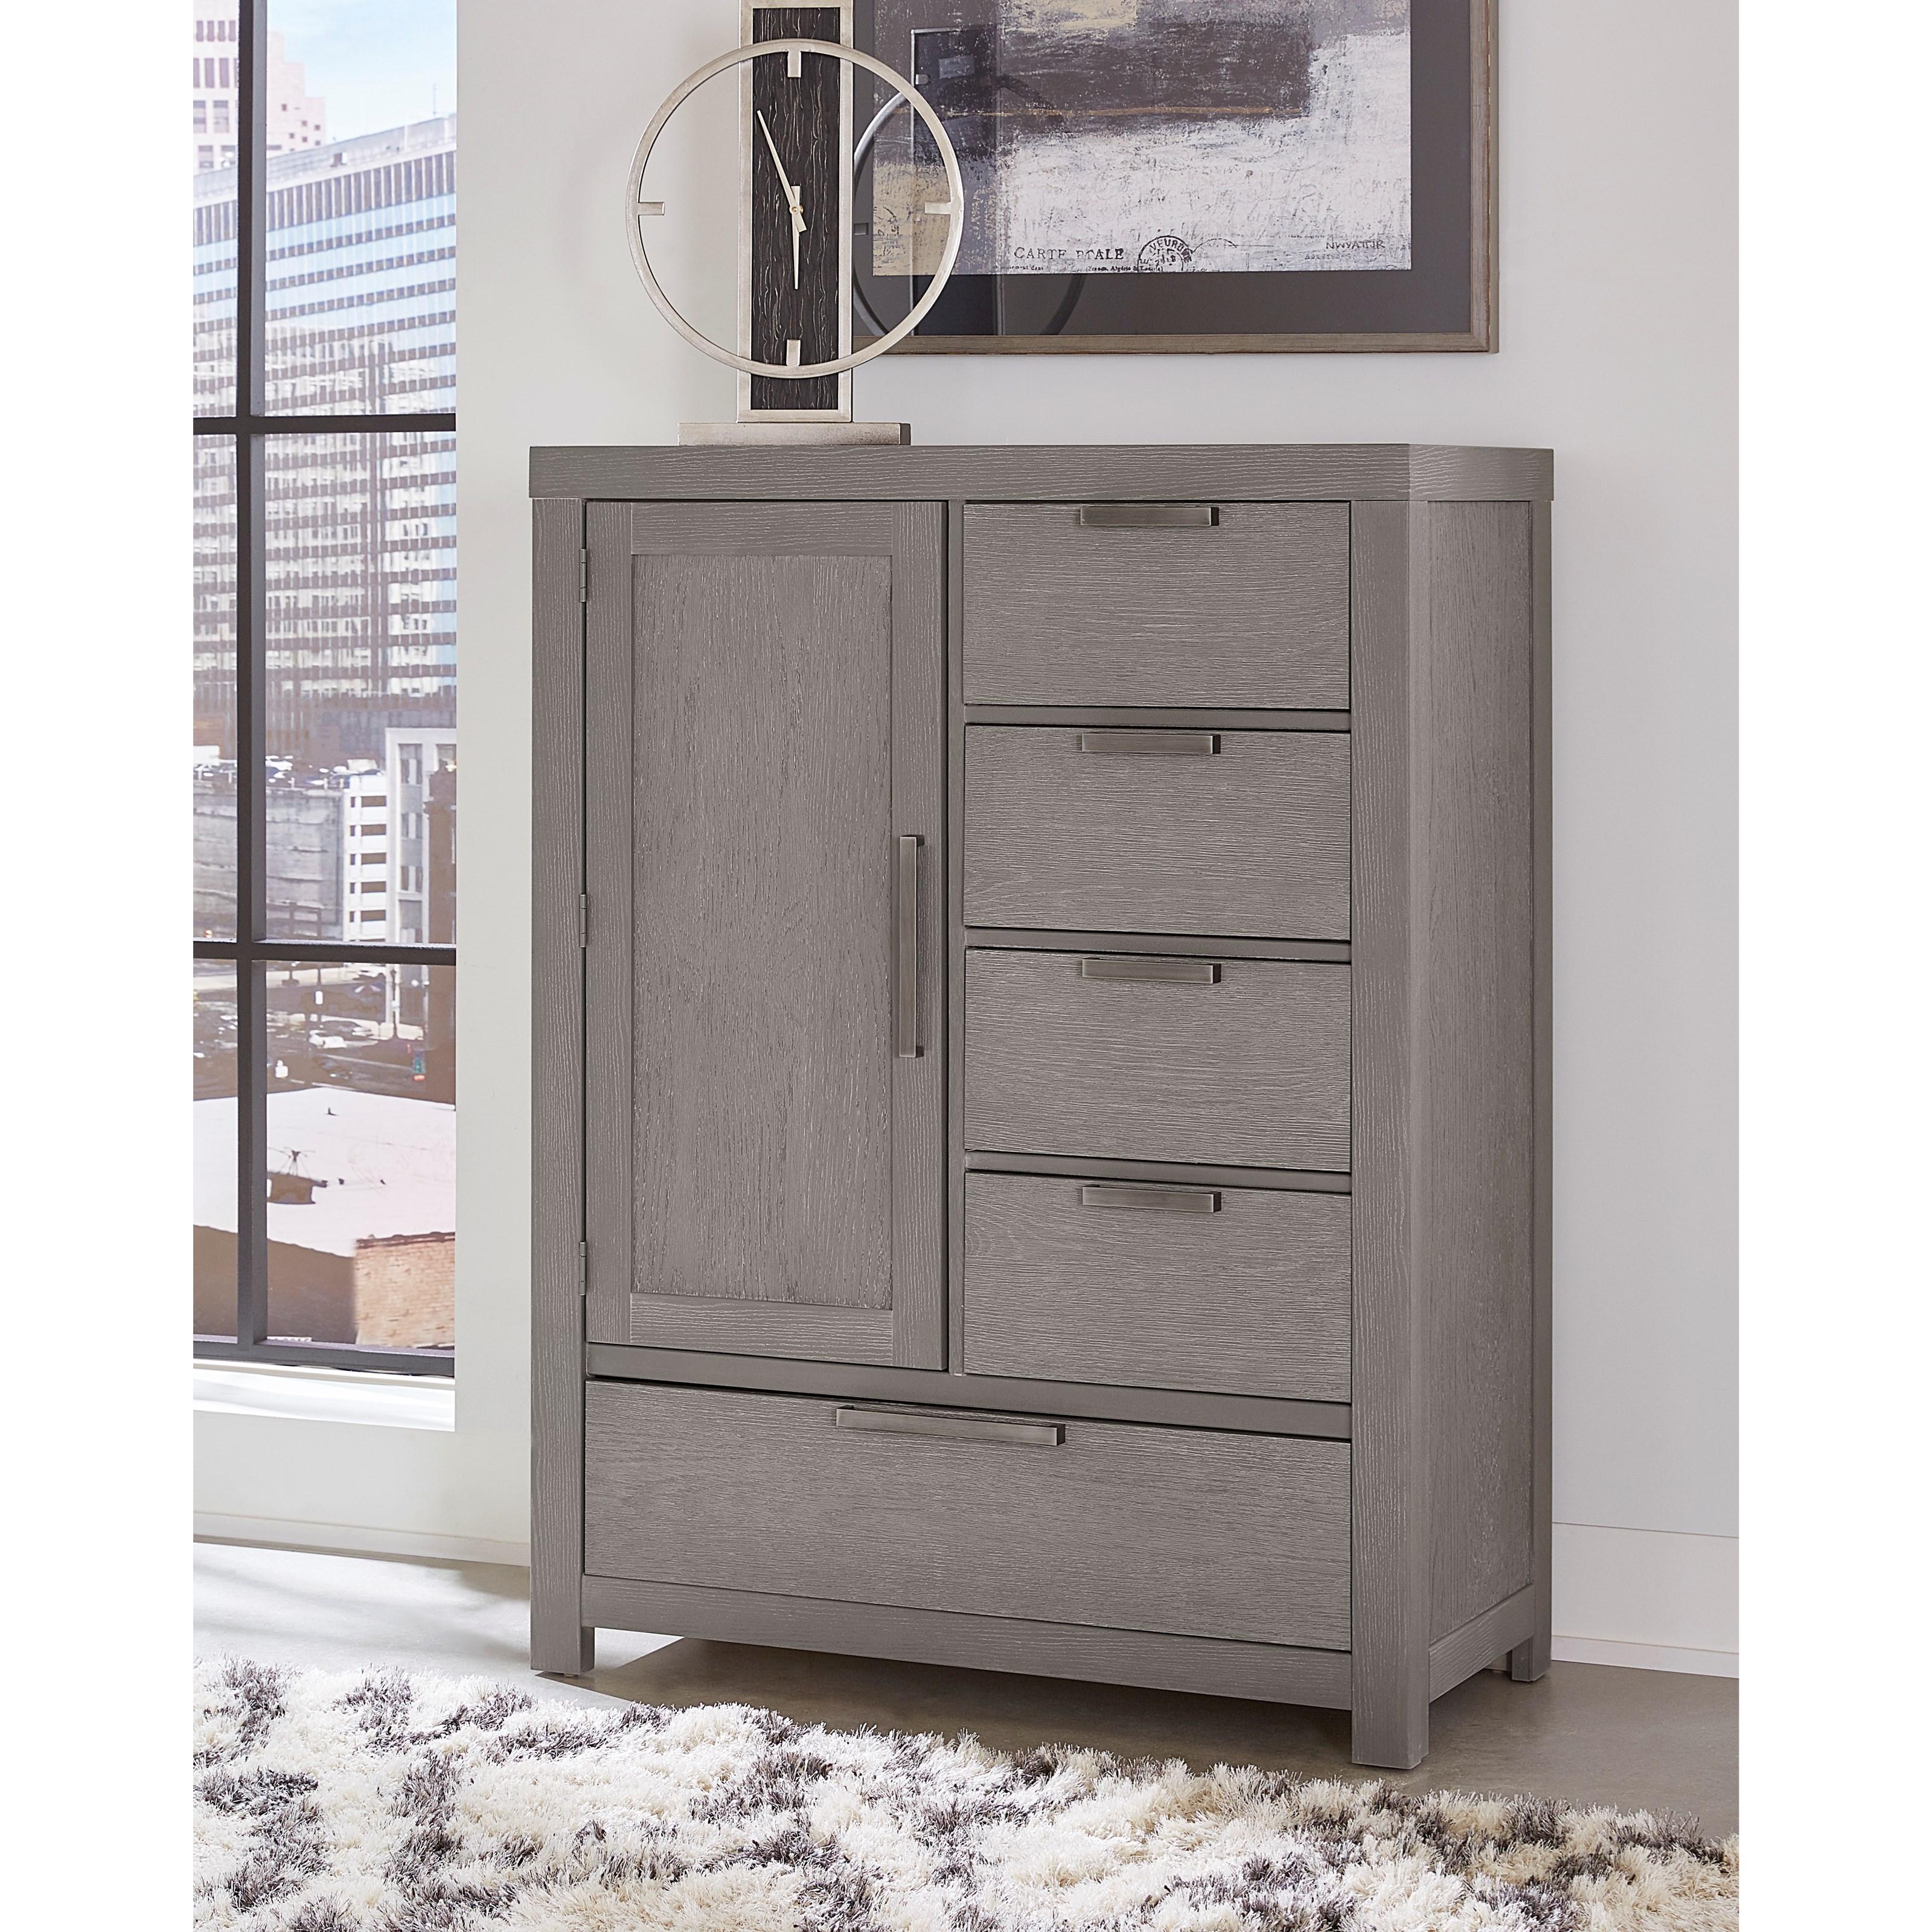 ... Vaughan Bassett American ModernArmoire   1 Door, 5 Drawers